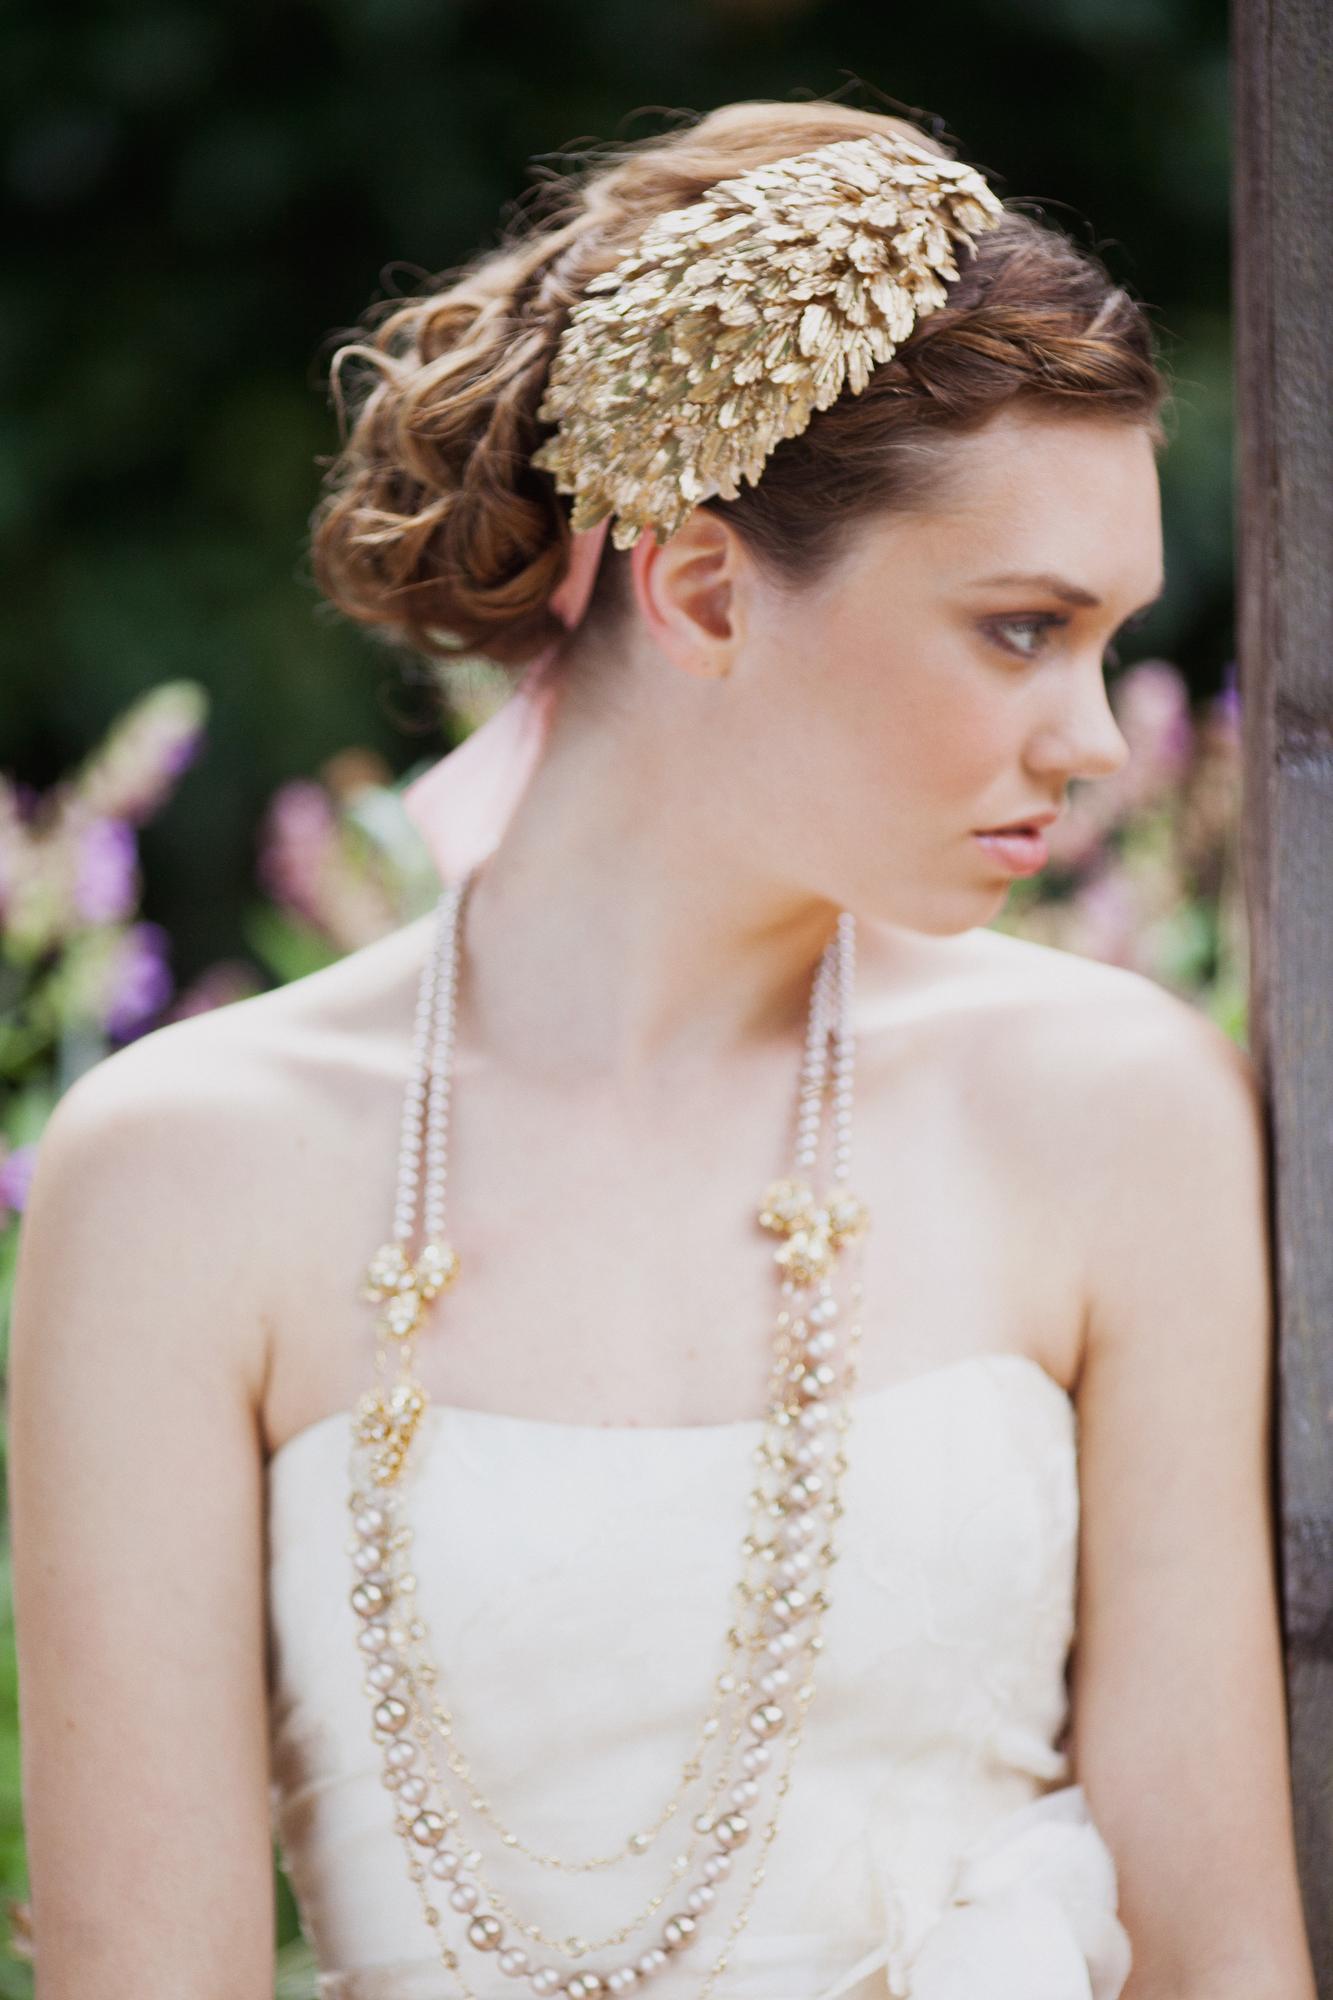 jennifer-skog-bridal-fashion-photographer-lifestyle-0011.jpg